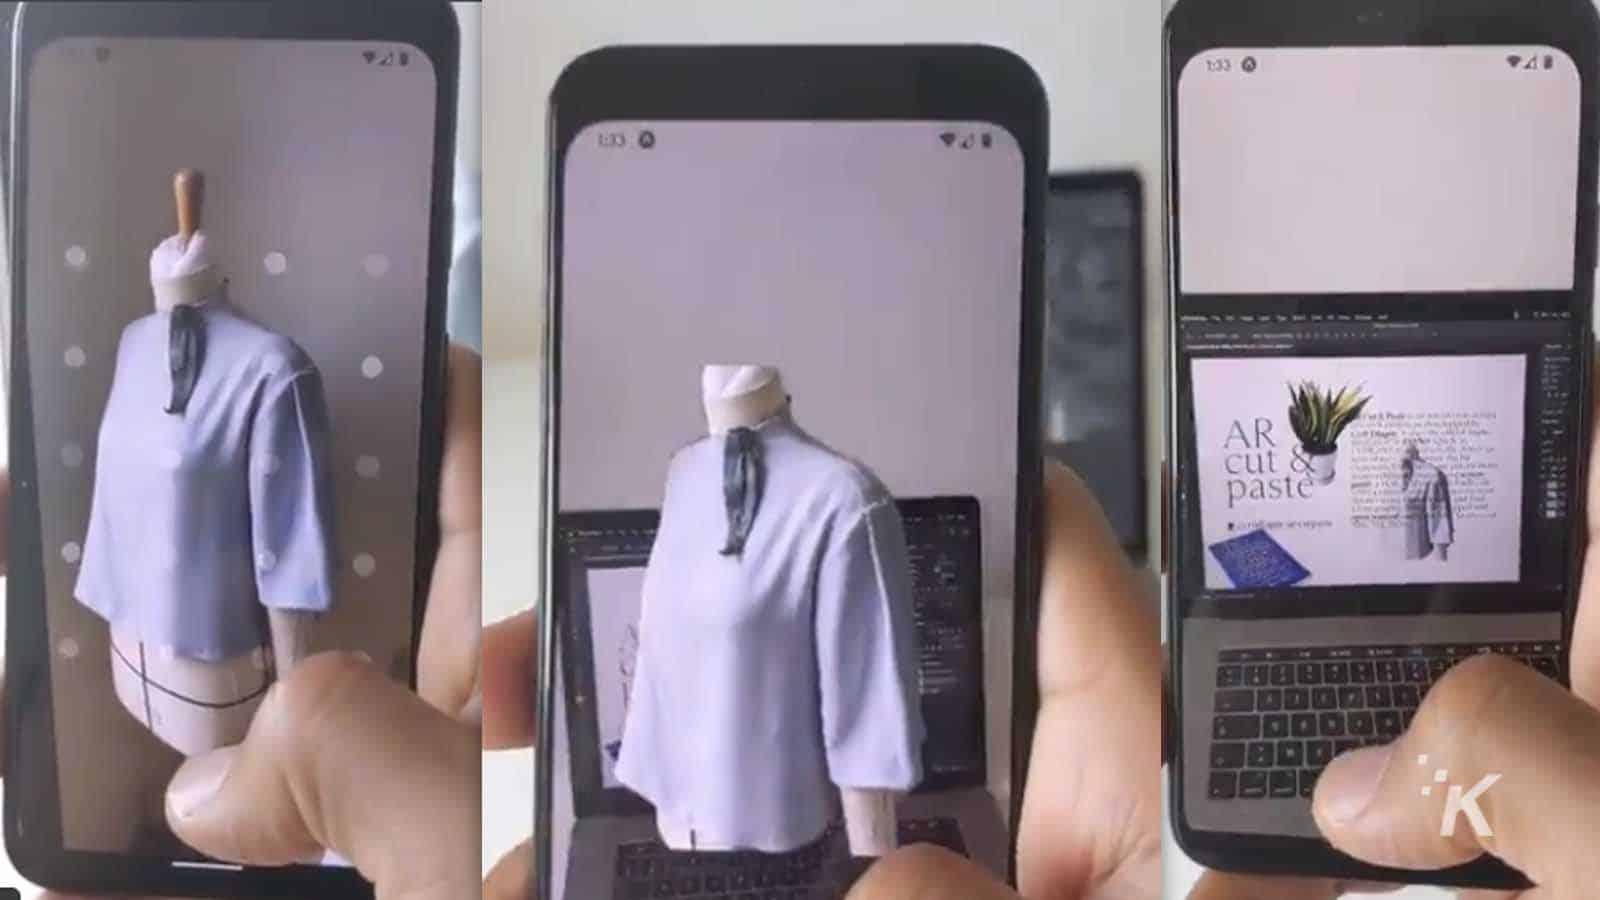 augmented reality ar tool